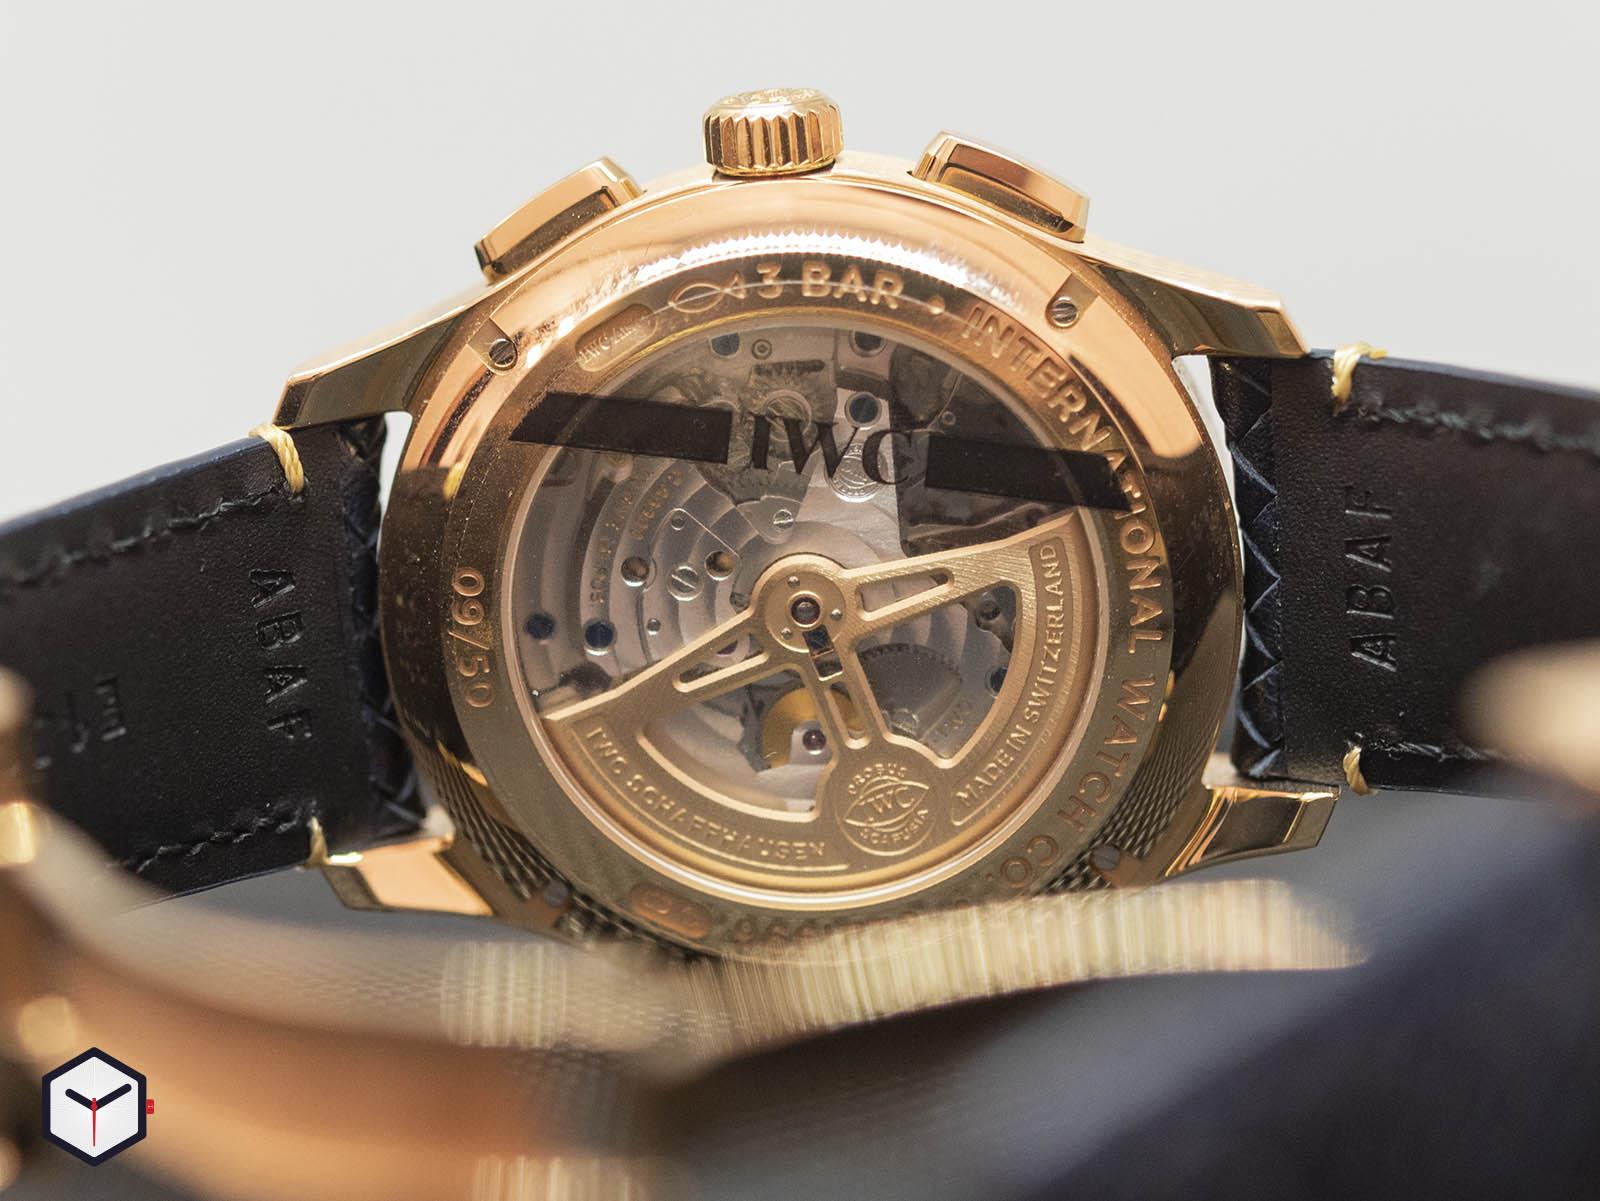 iw394005-iwc-portugieser-tourbillon-retrograde-chronograph-boutique-edition-5.jpg